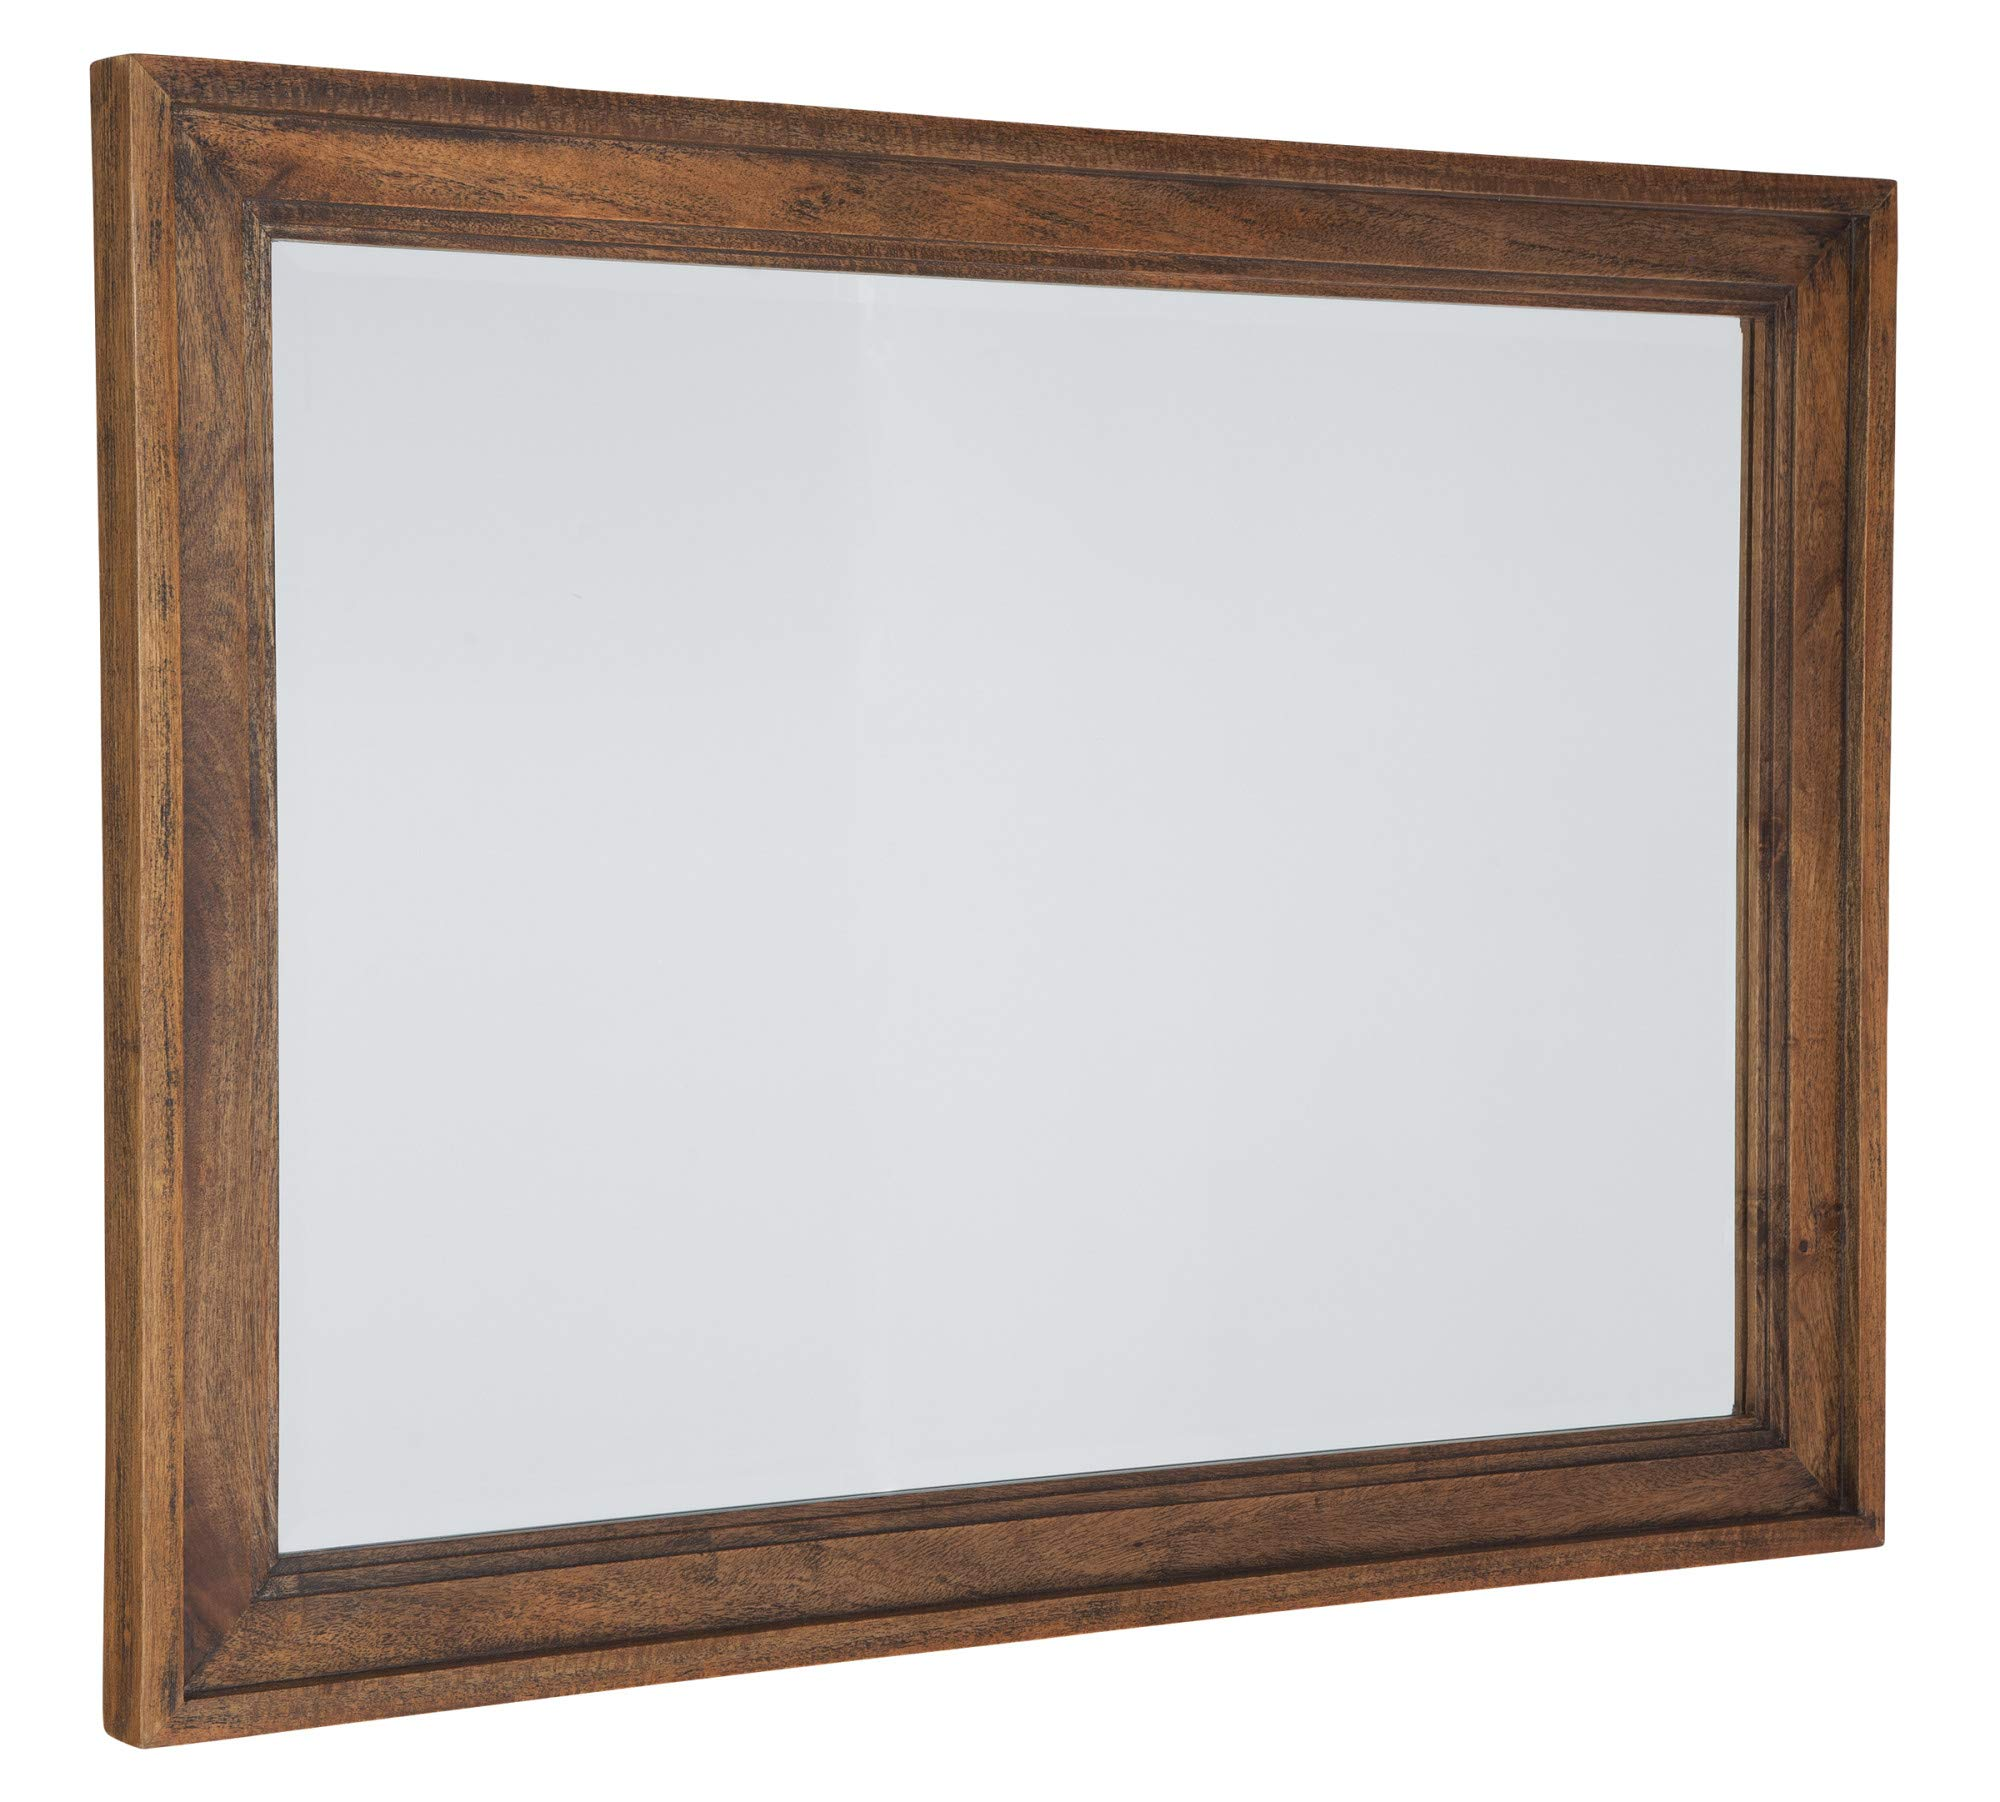 Hekman Furniture 23768 Mirror